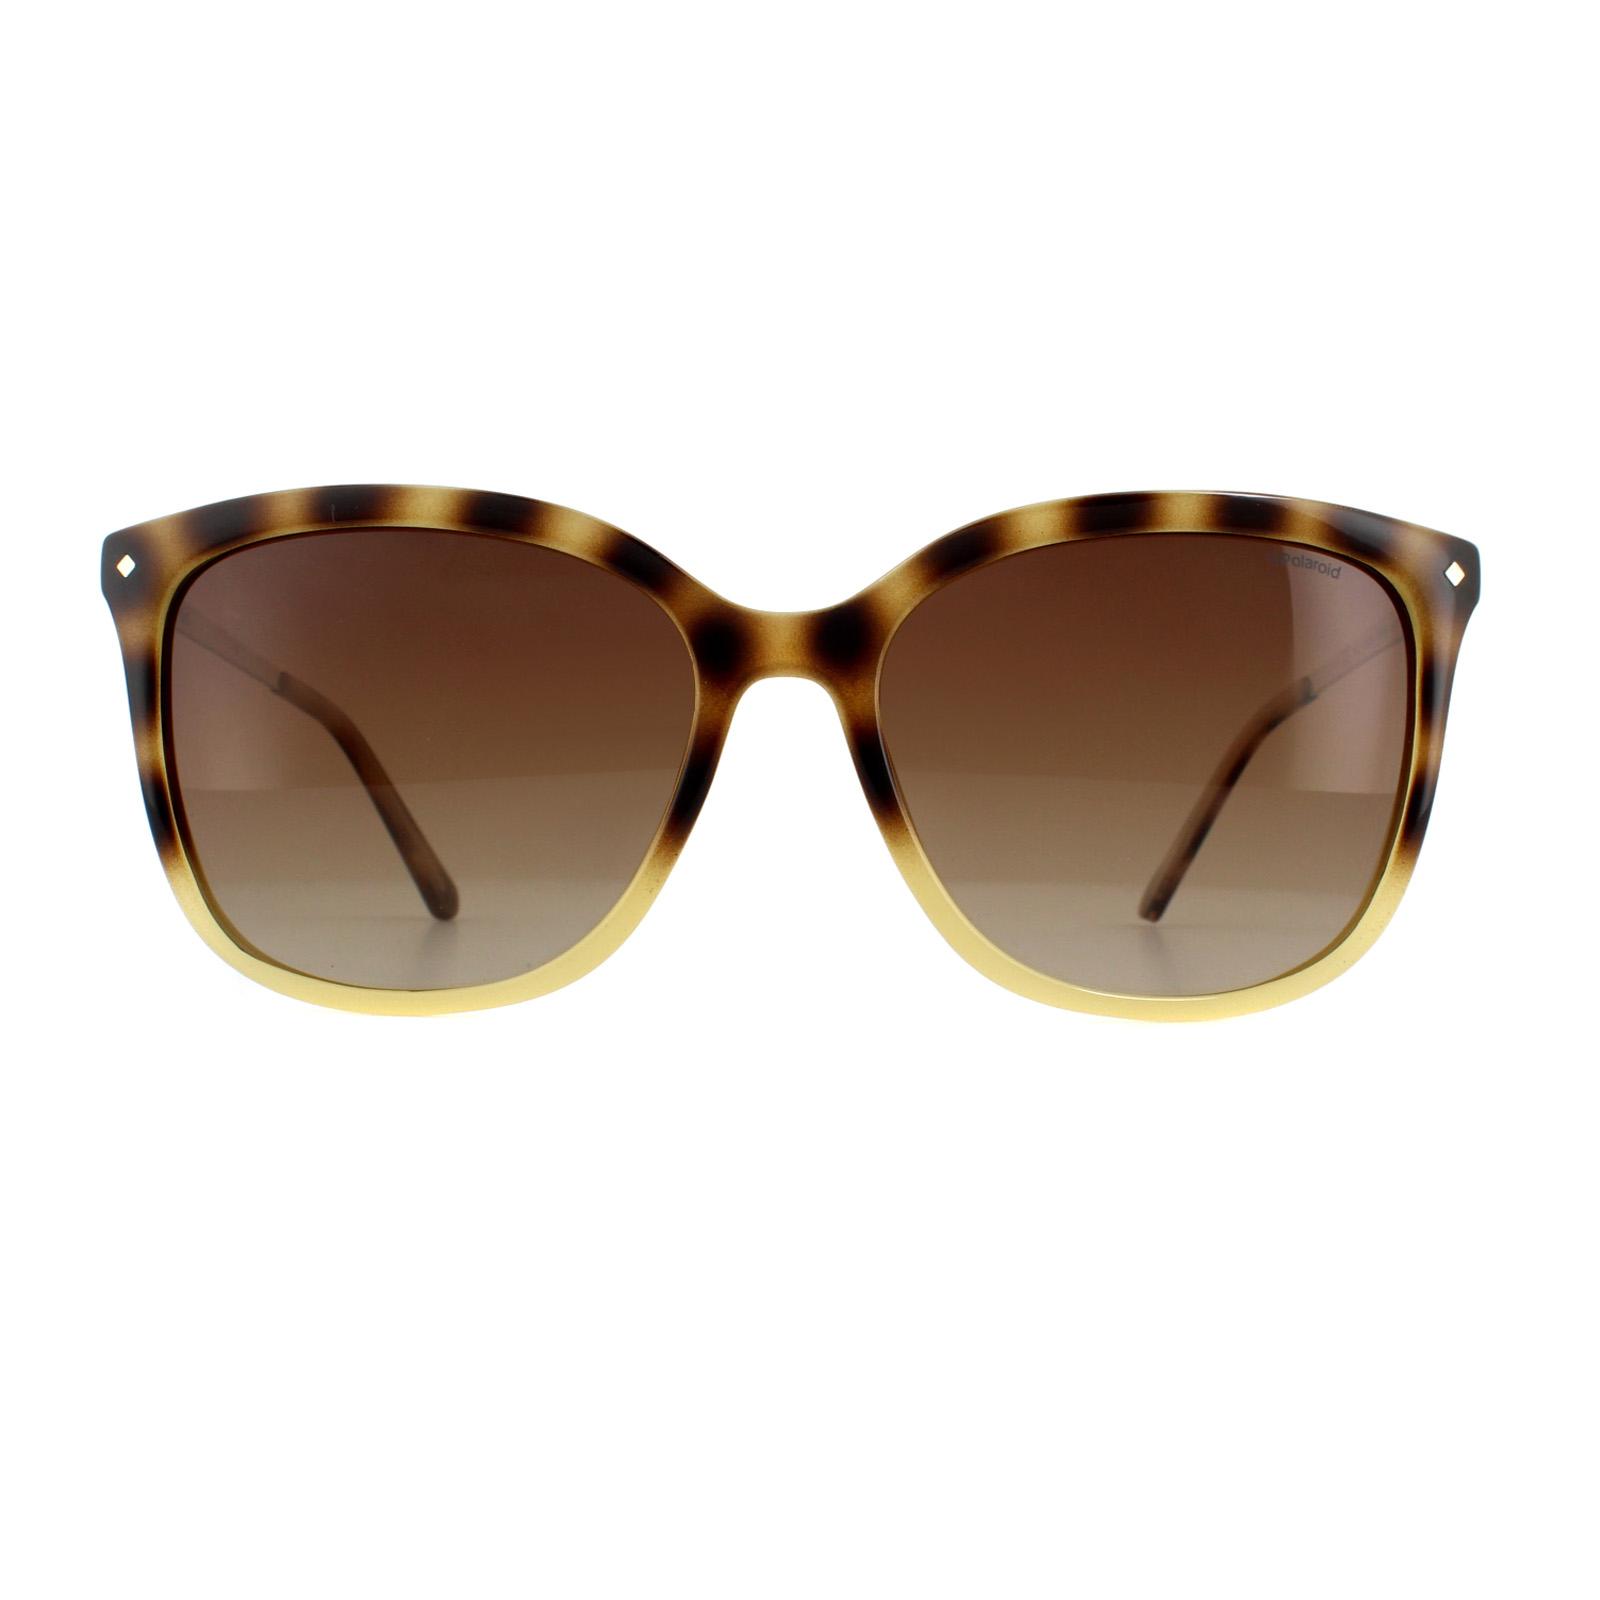 0c272cc302 Sentinel Polaroid Sunglasses PLD 4043 S Y67 X3 Havana Gold Brown Polarized